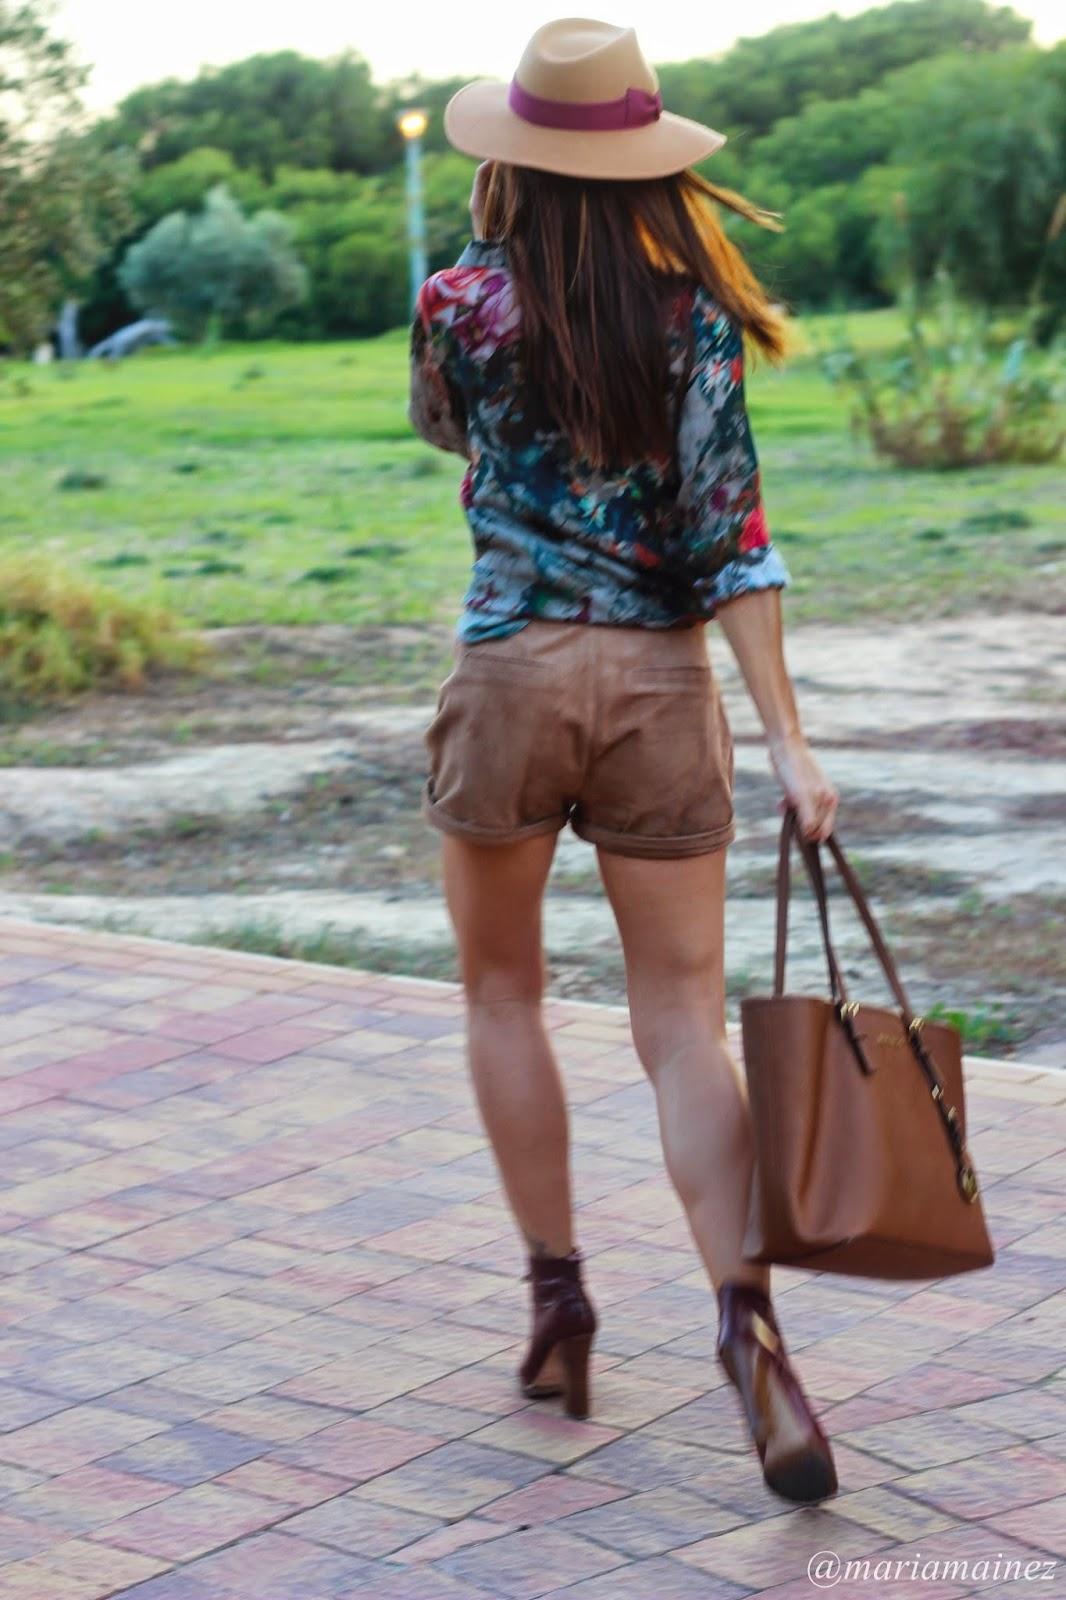 Sombrero Jamir - Etxart&Panno - Michael Kors - Outfit 2014 - Baltarini shoes - blogger alicante